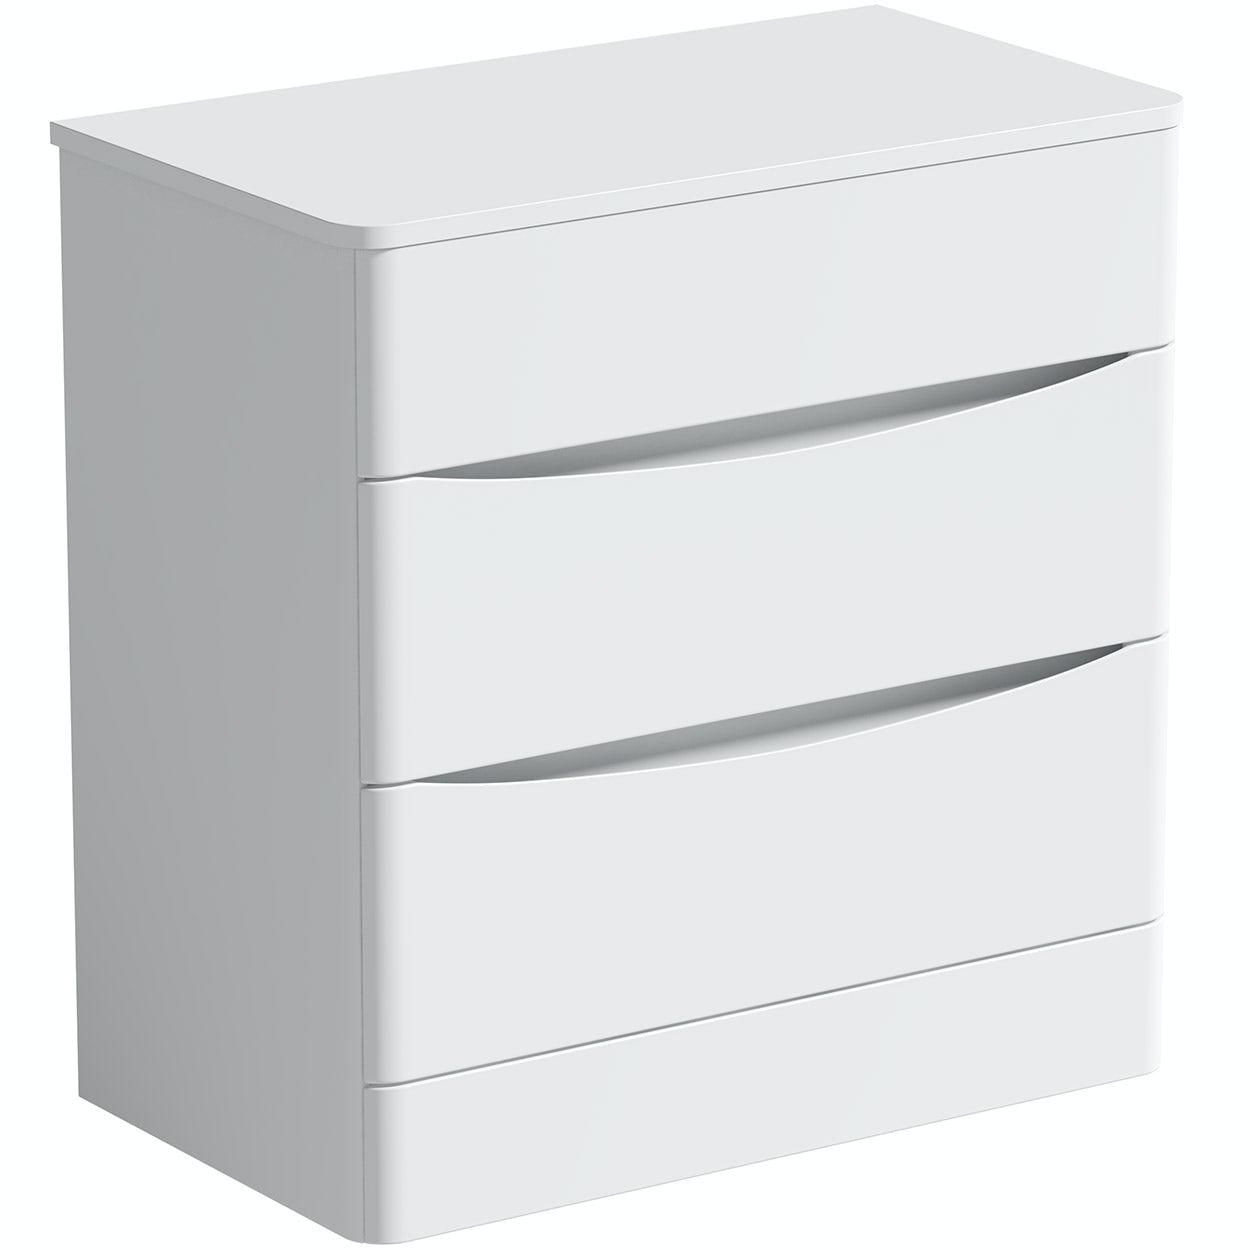 Mode Adler white 800mm floorstanding vanity unit with countertop